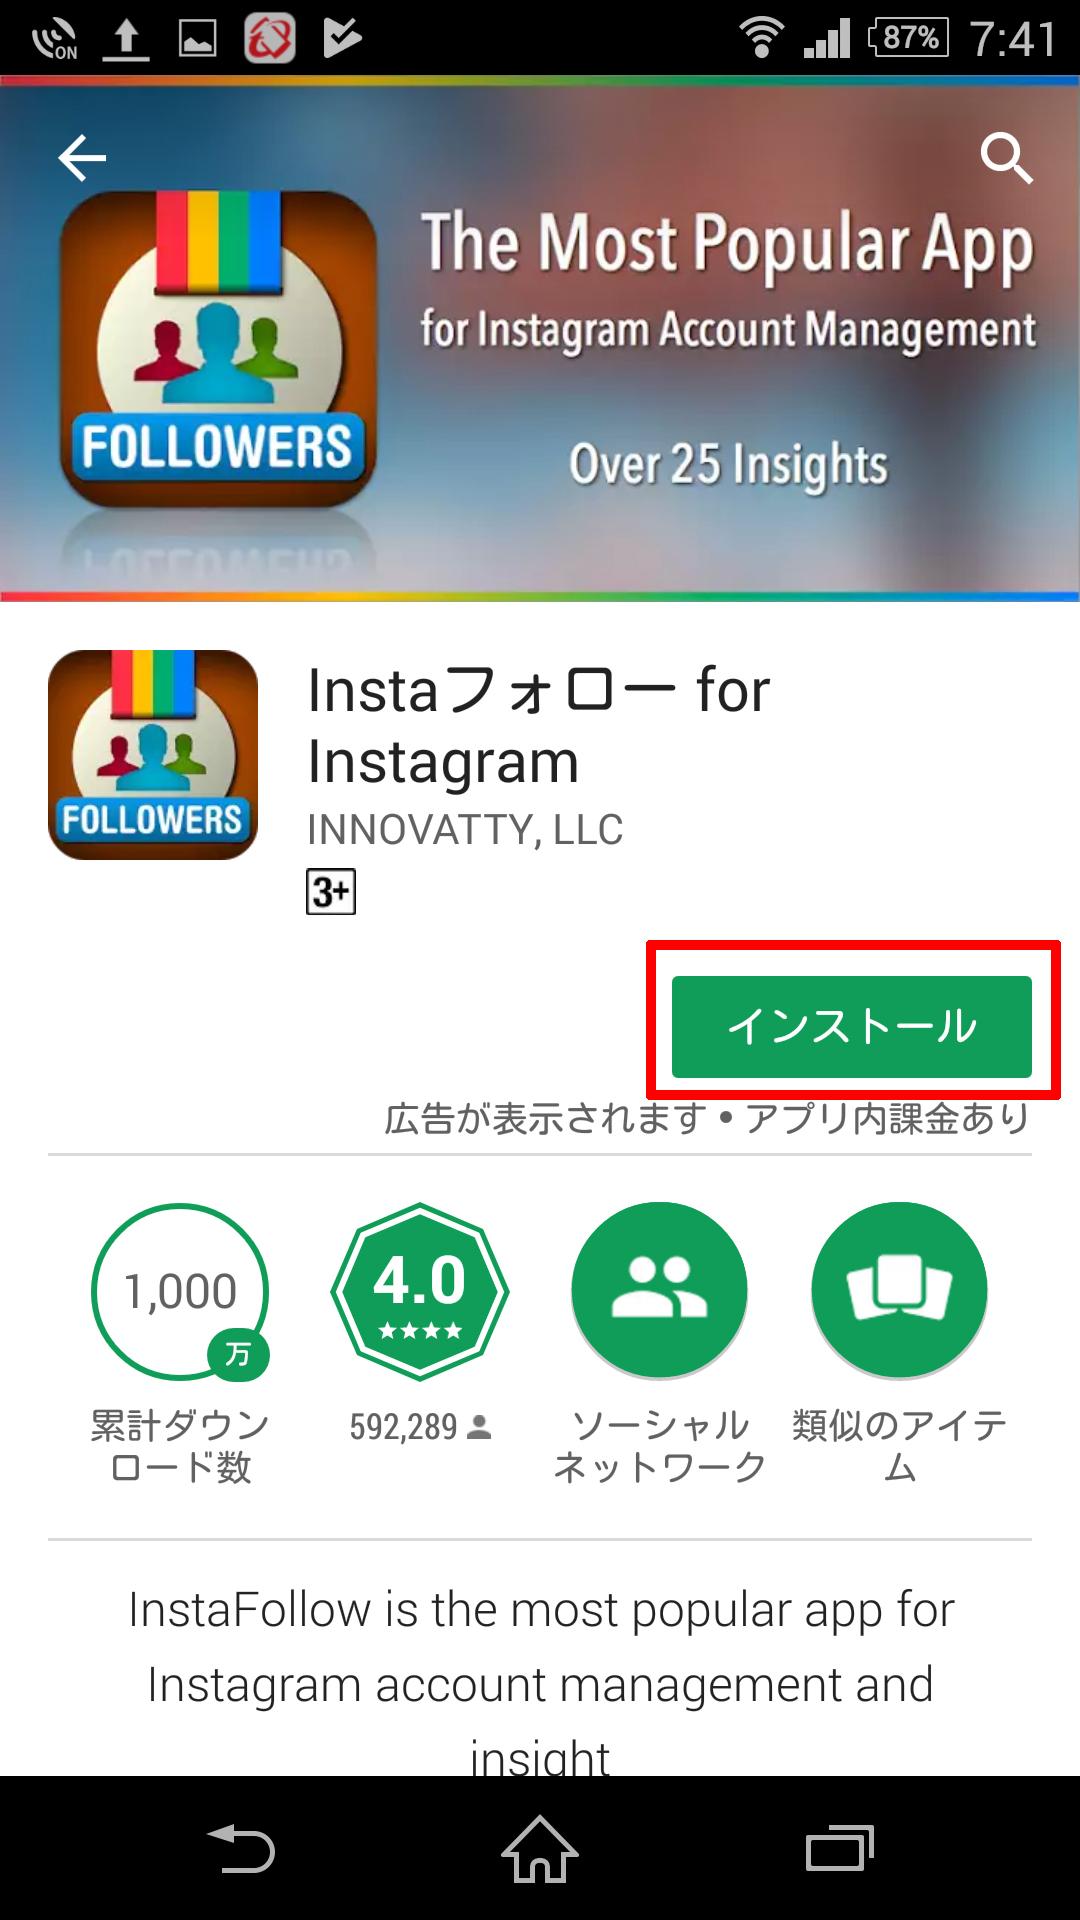 Insta Follow